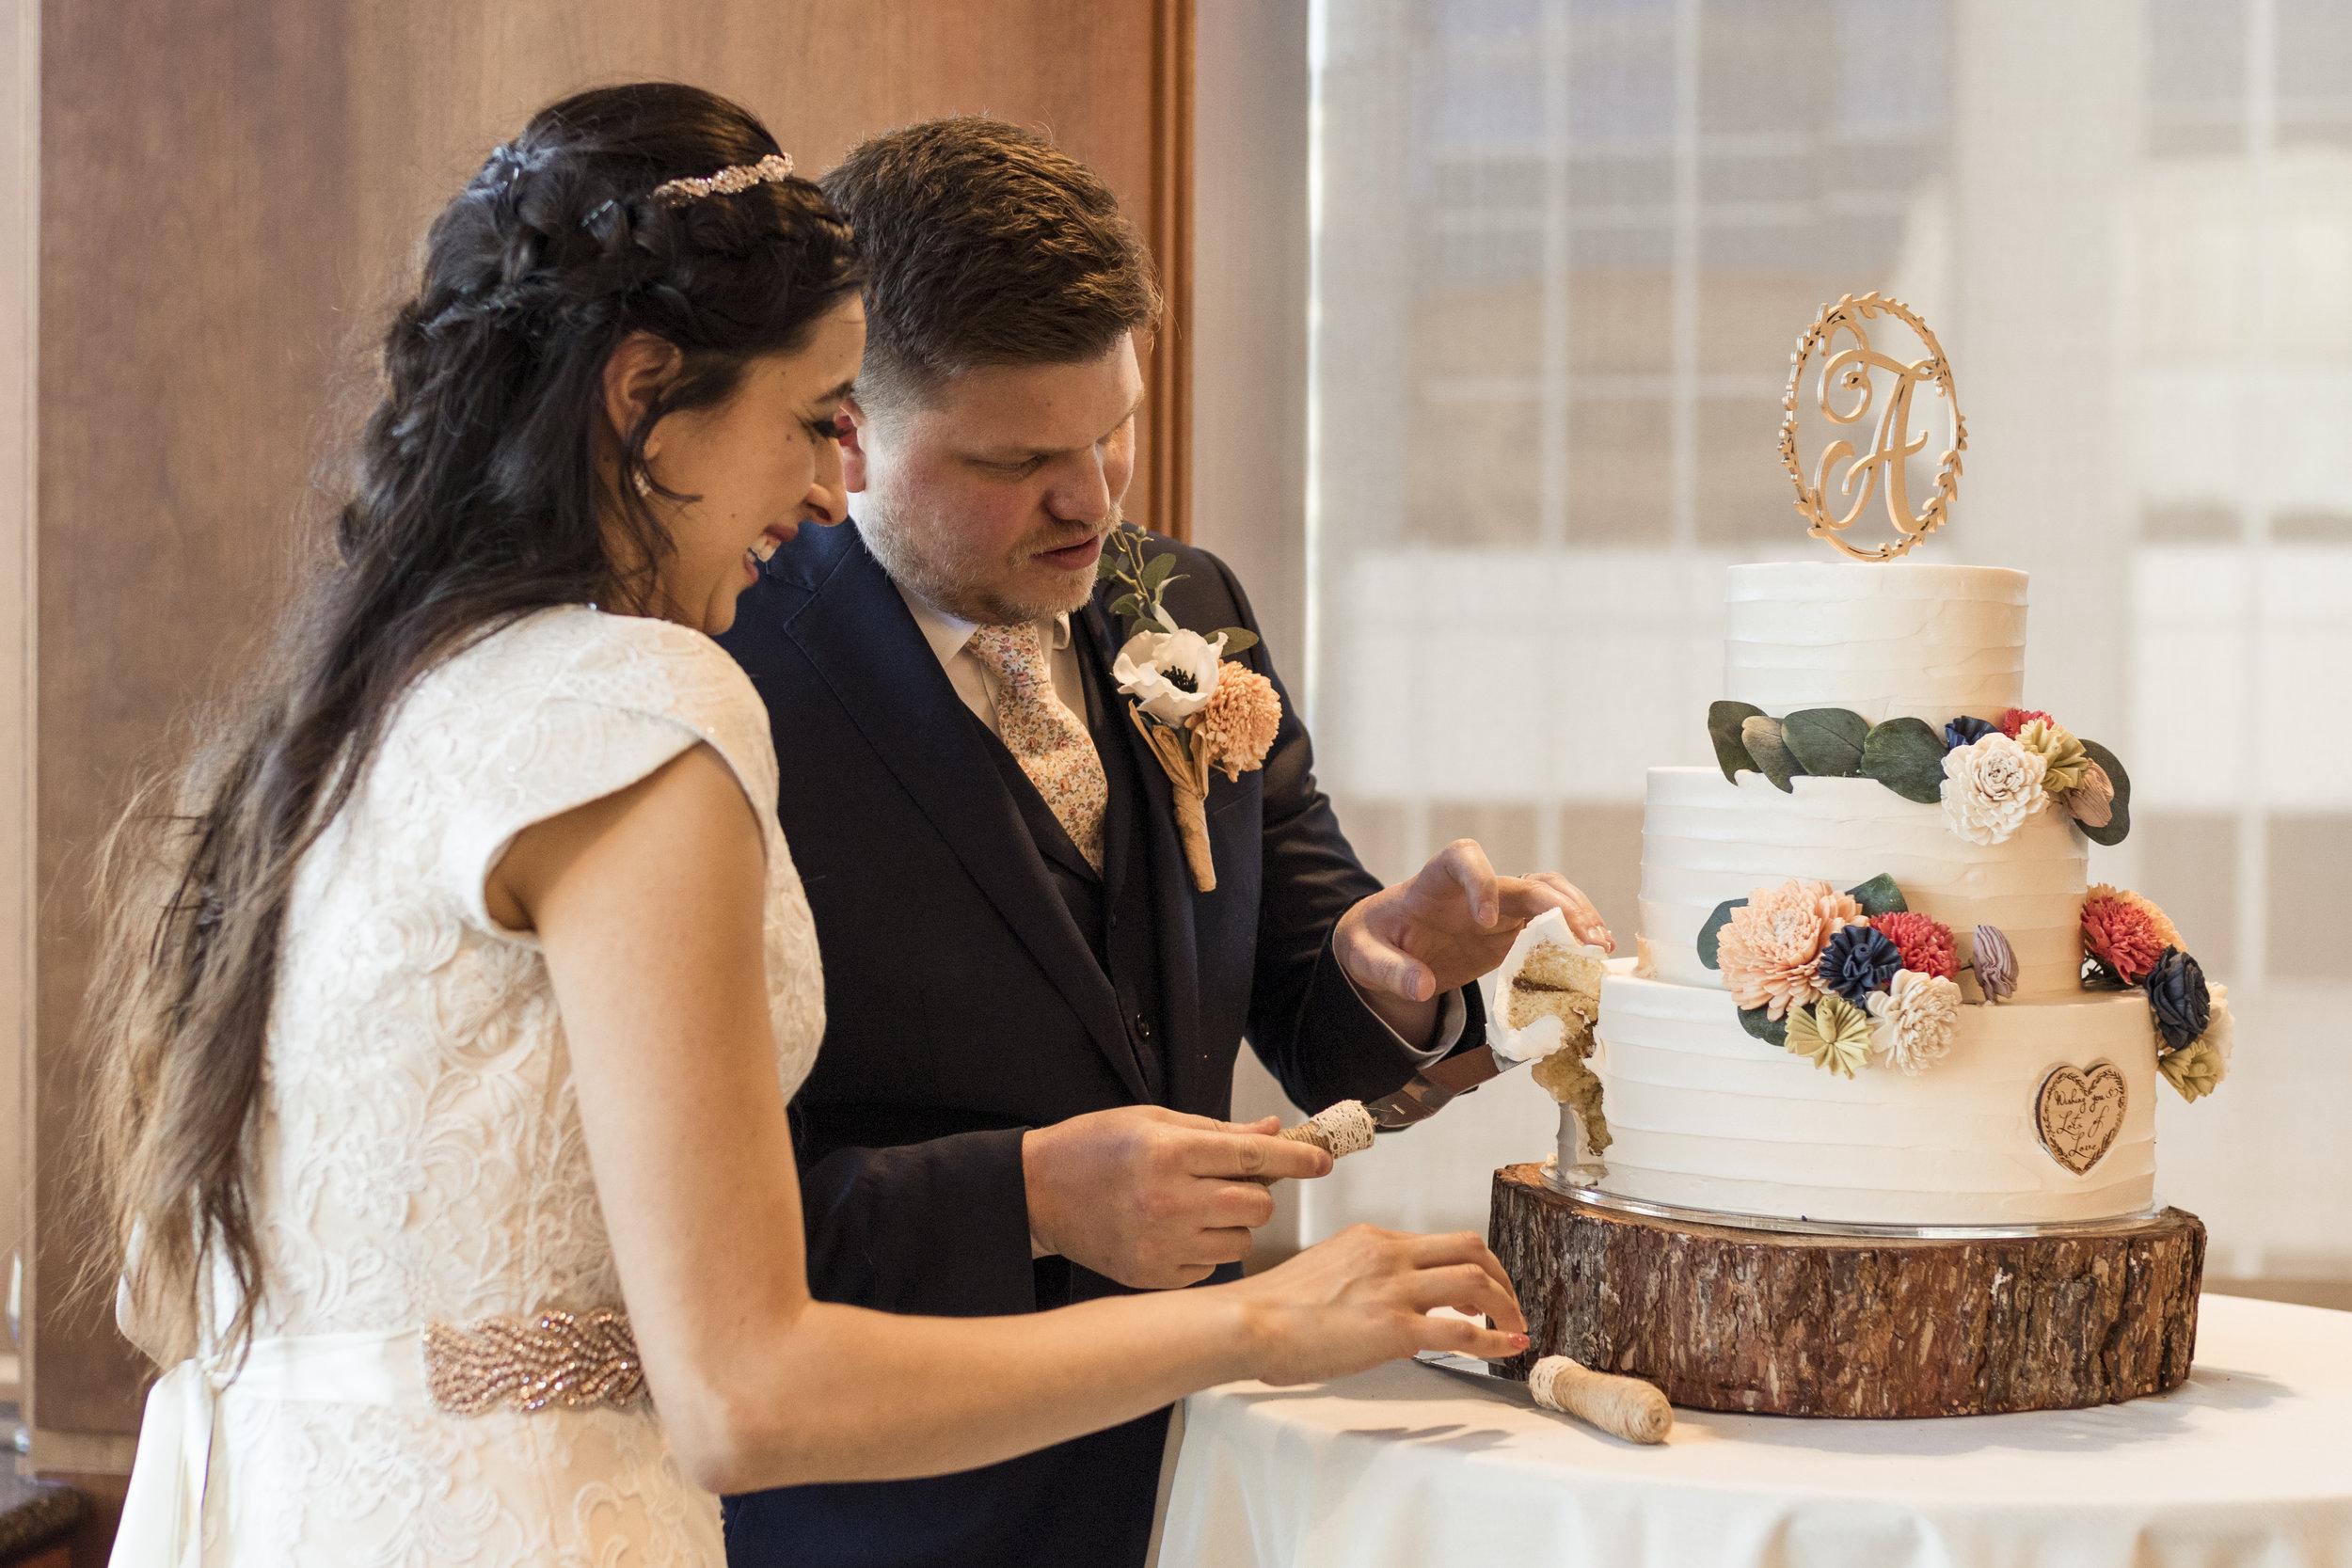 Utah Spring Wedding Reception in the Zions Bank Founders Room by Bri Bergman Photography14.JPG